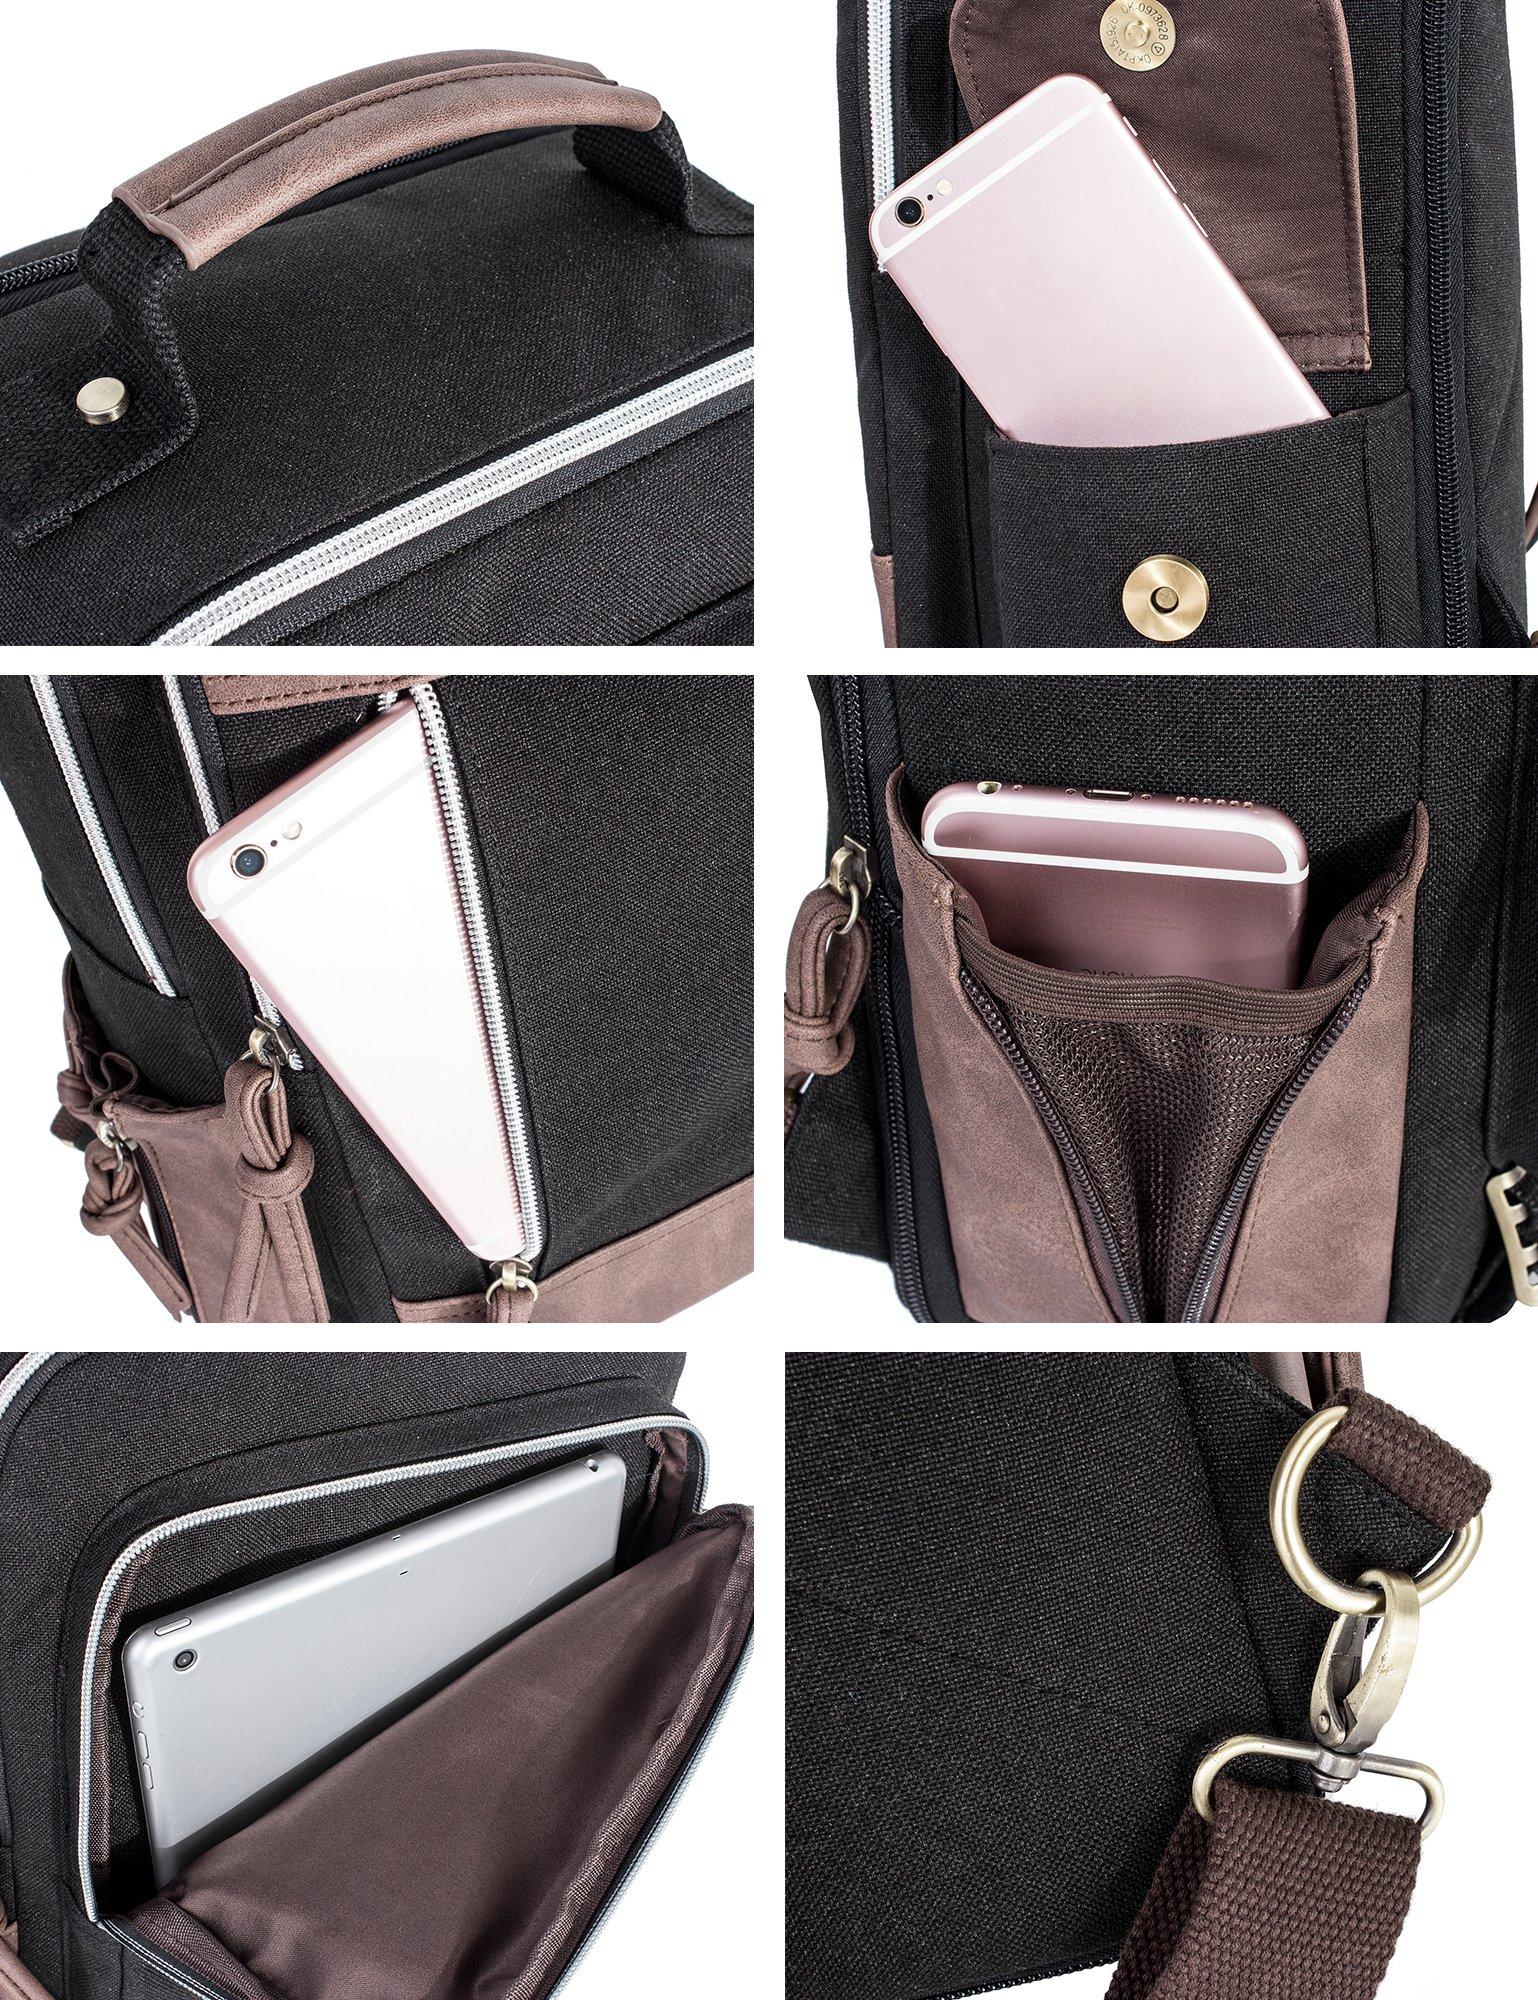 Leaper Retro Messenger Bag Outdoor Cross Body Sling Bag Travel Bag Shoulder Backpack (Black3103) by Leaper (Image #7)